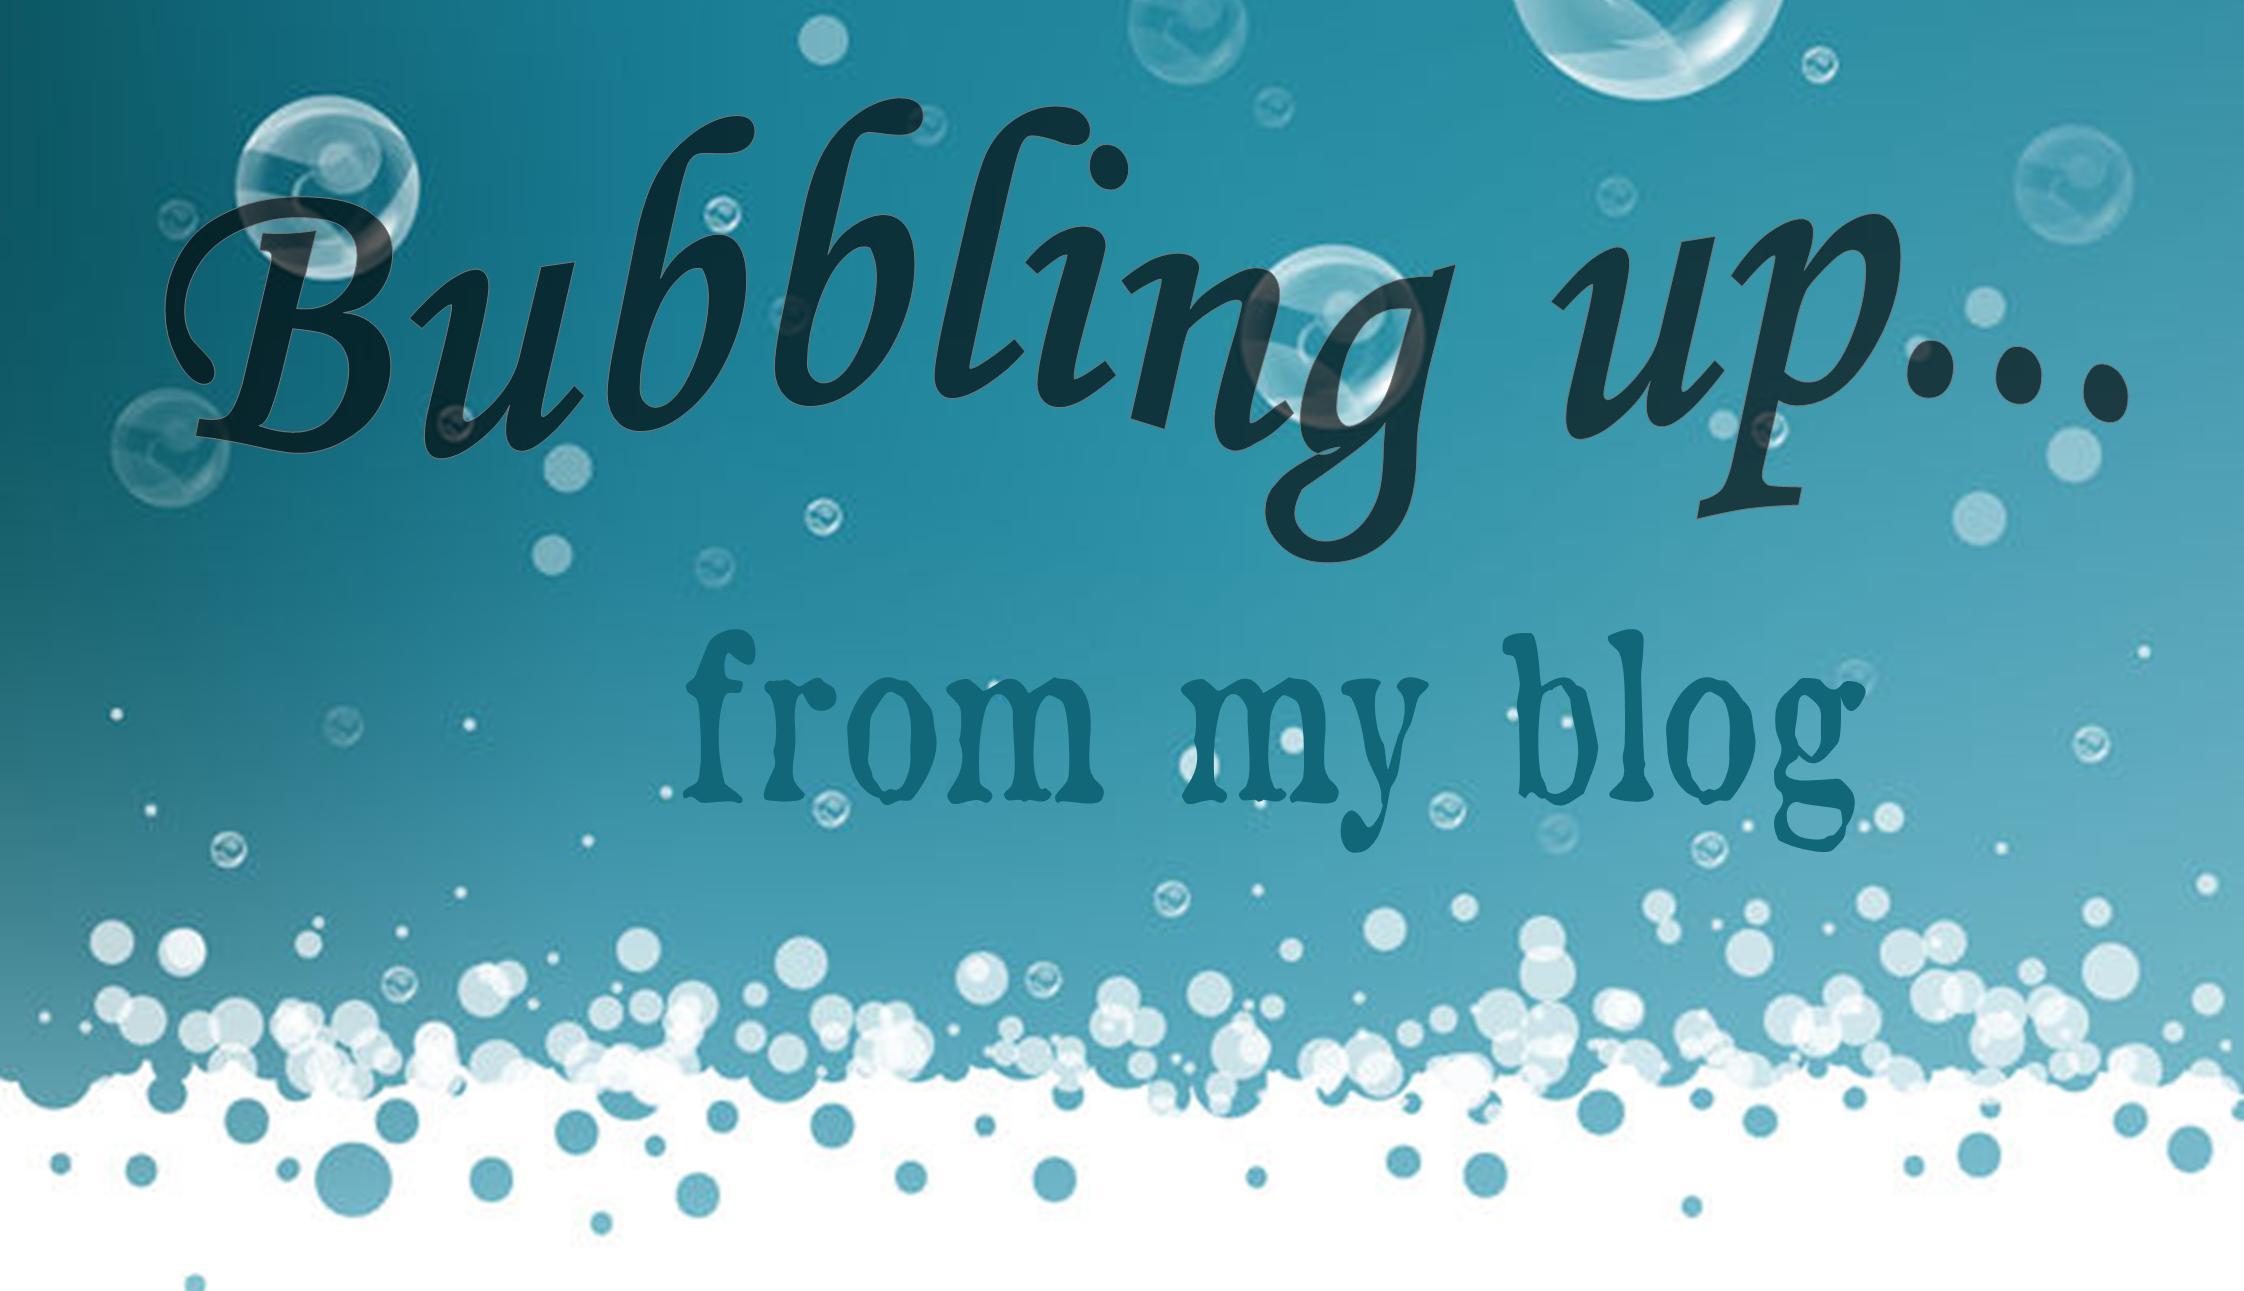 Bubbling-up-blog3.jpg